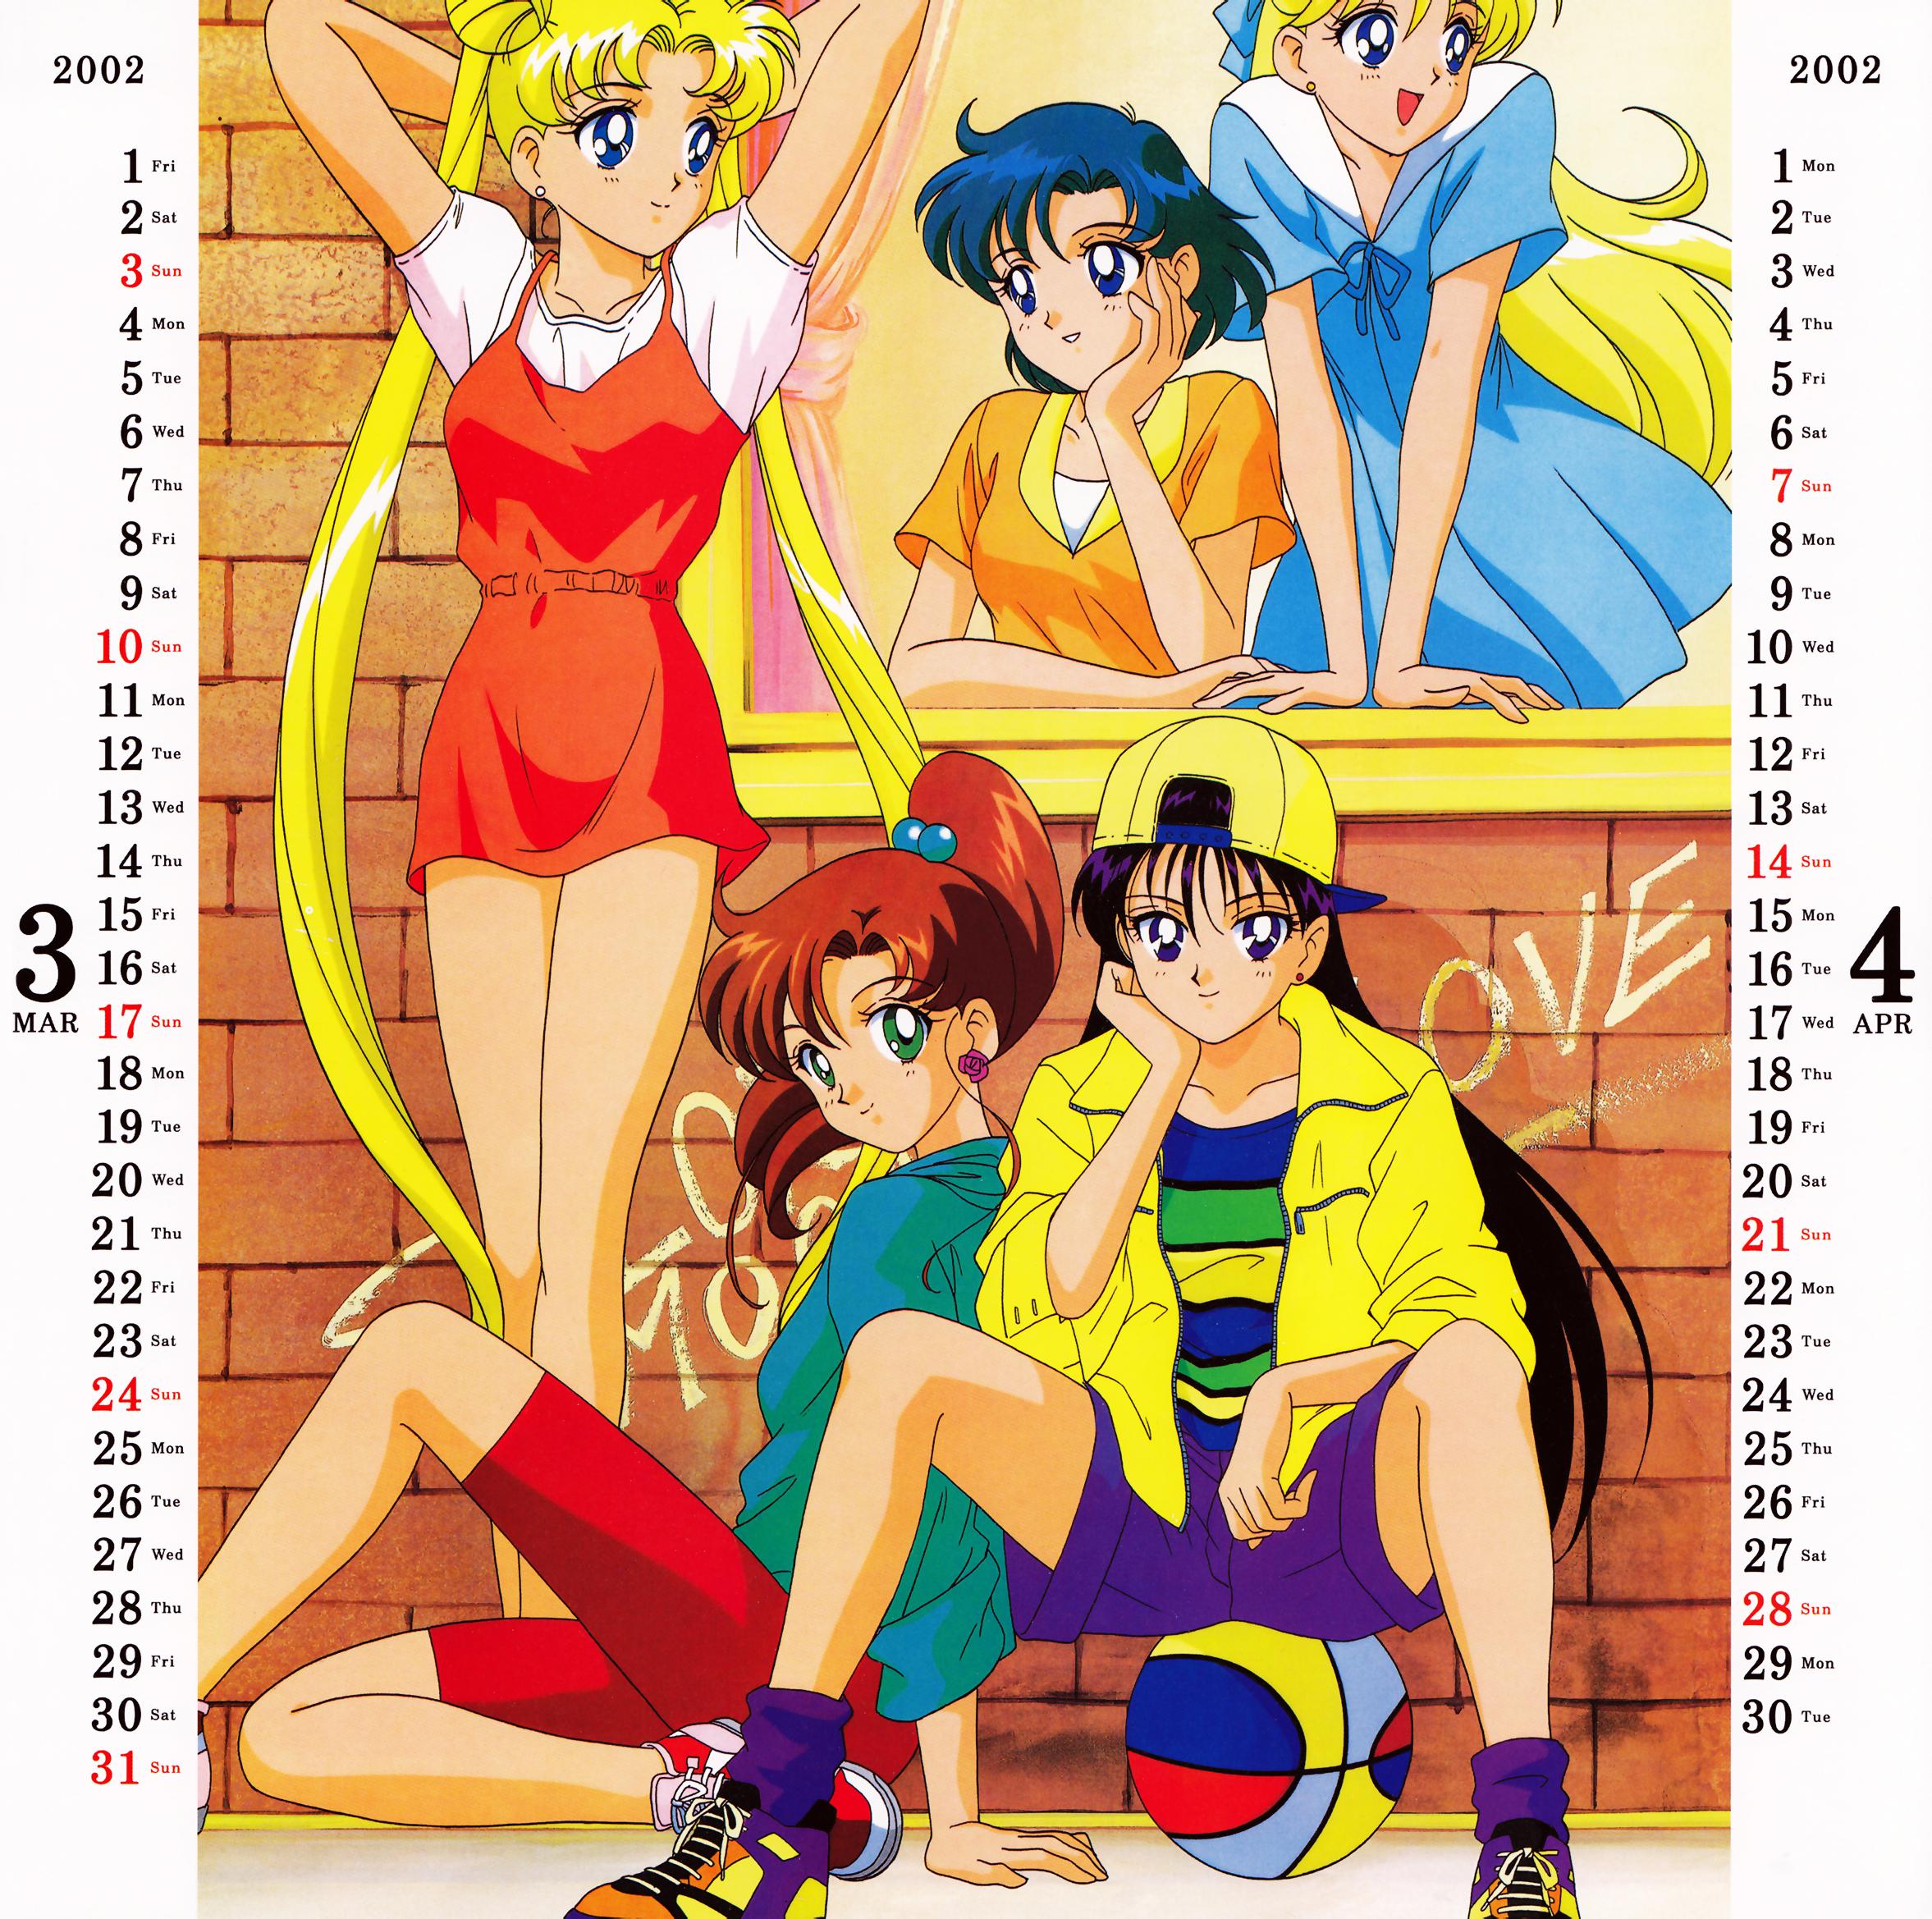 2002_calendar_04